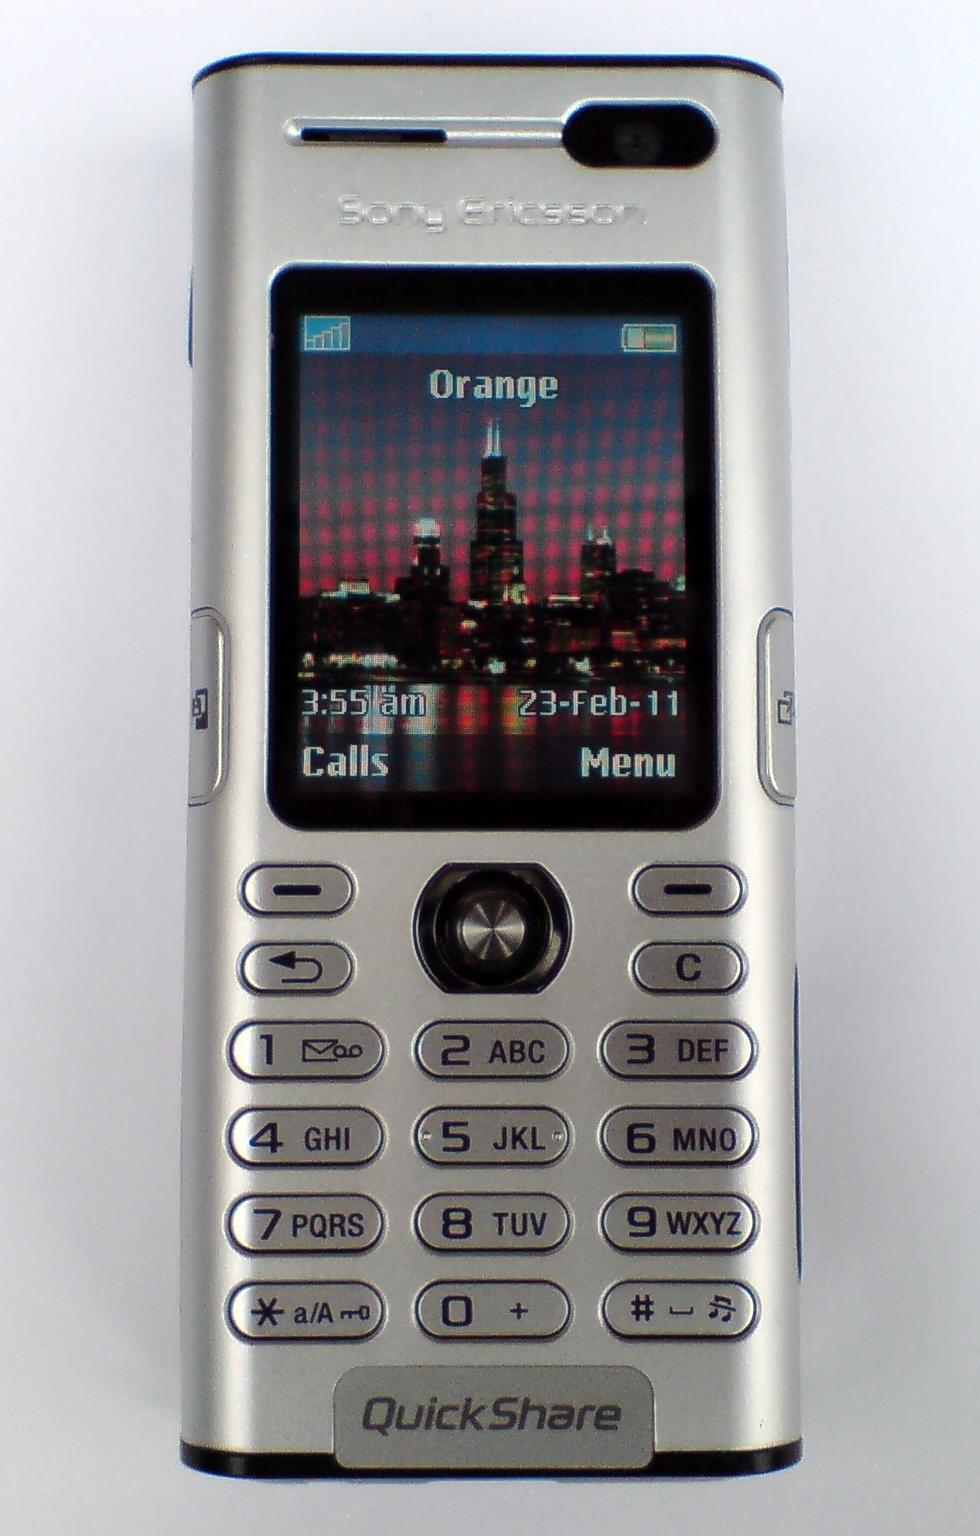 Mans pirmais mobilais telefons, vai kādi telefoni man ir bijuši - Page 2 Sony_Ericsson_K600i,_front,_switched_on